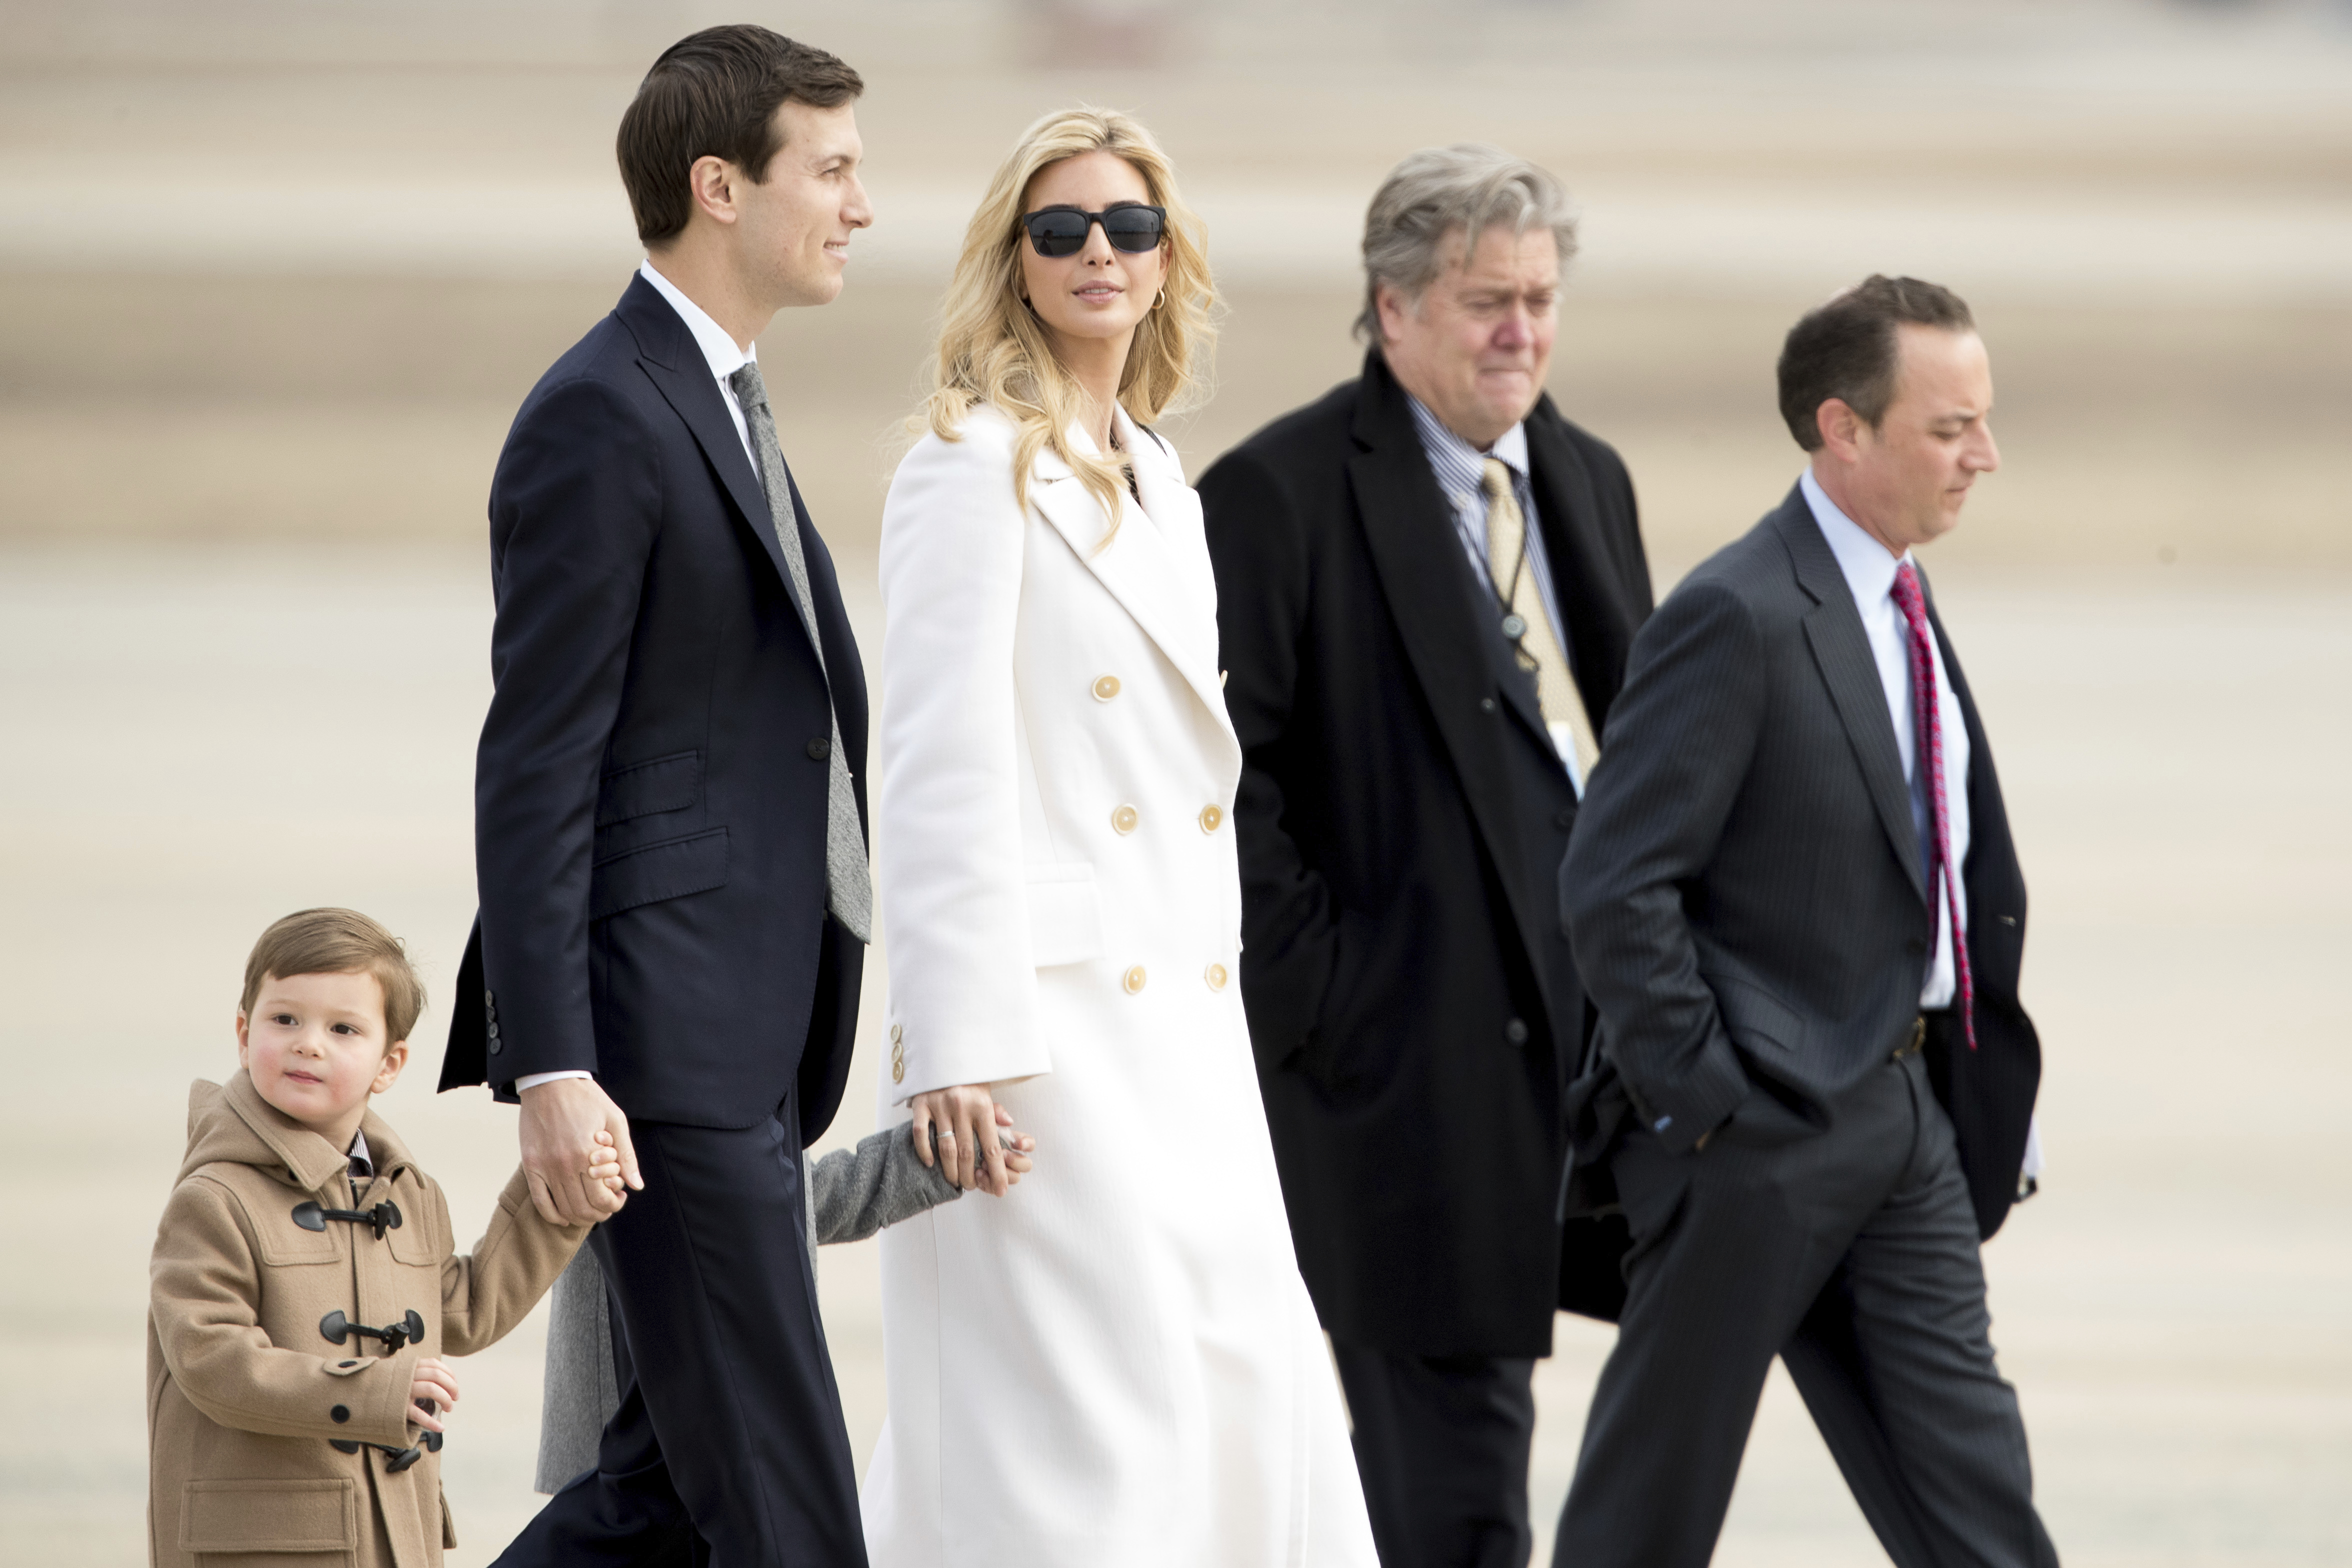 Ivanka Trump, Jared Kushner, Arabella Kushner, Joseph Kushner, Steve Bannon, Reince Priebus